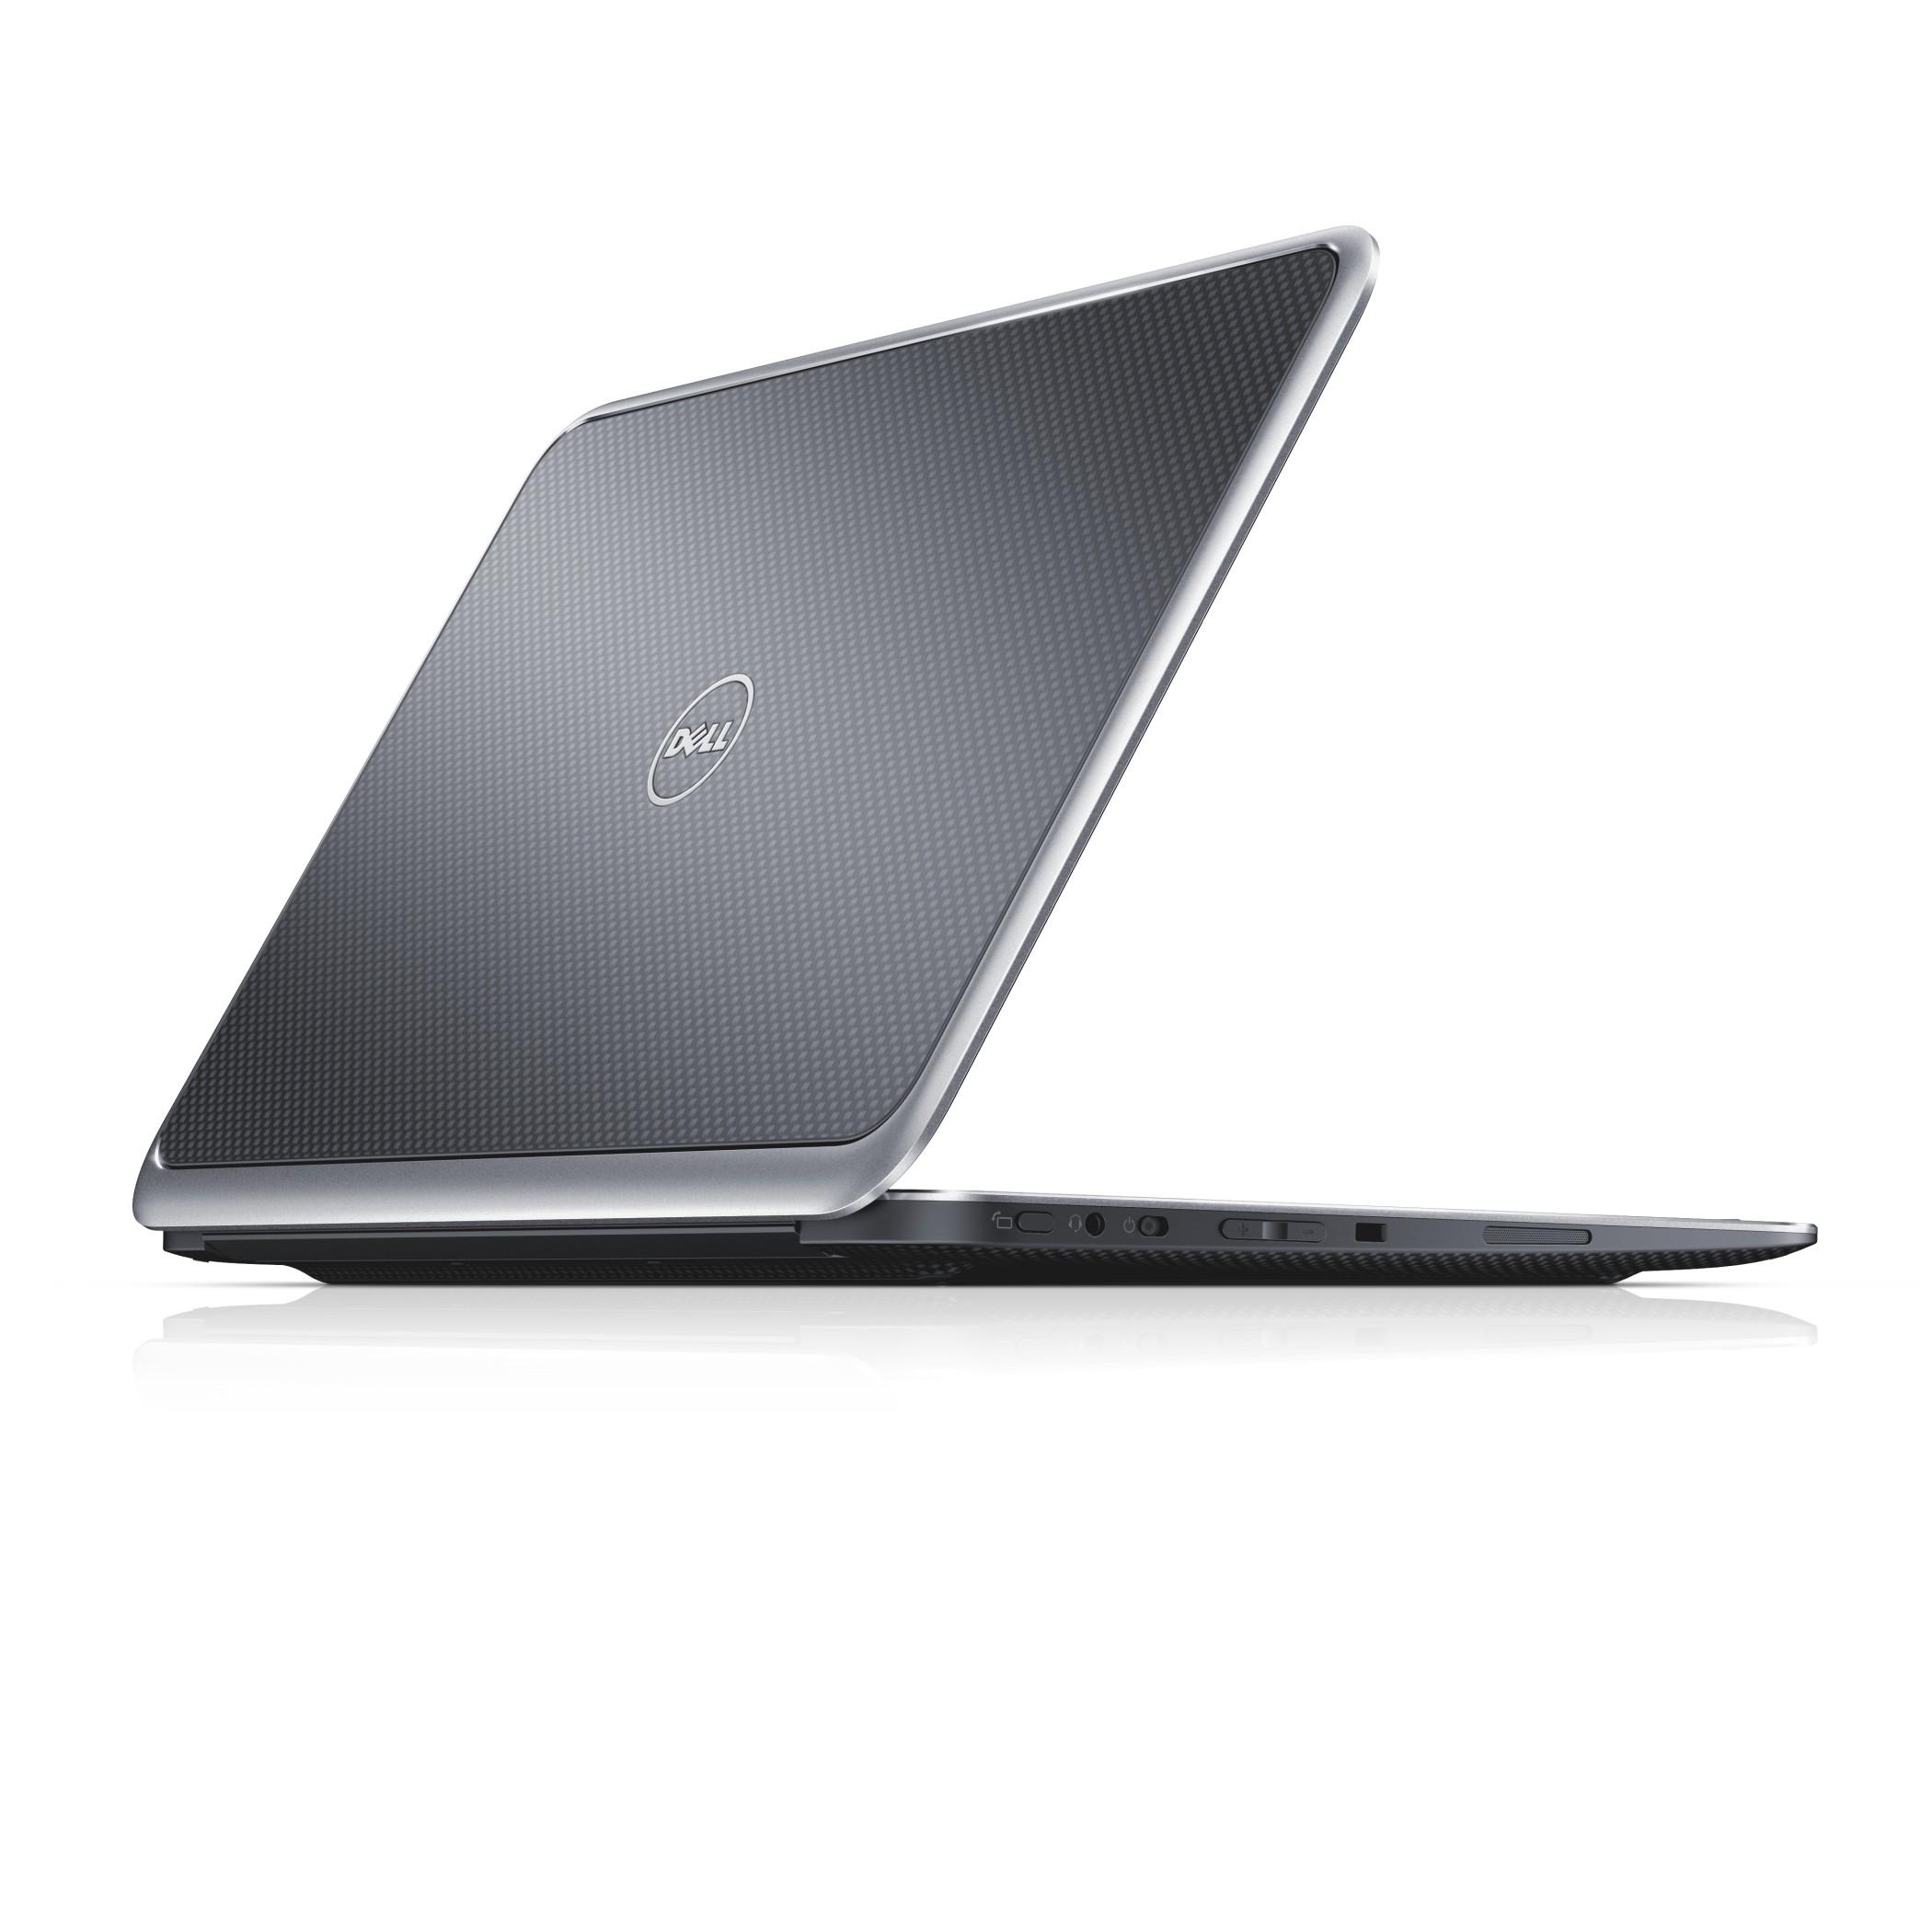 "DELL XPS 12 1.6GHz i5-4200U 12.5"" 1920 x 1080Pixel Touch screen Nero Computer portatile"